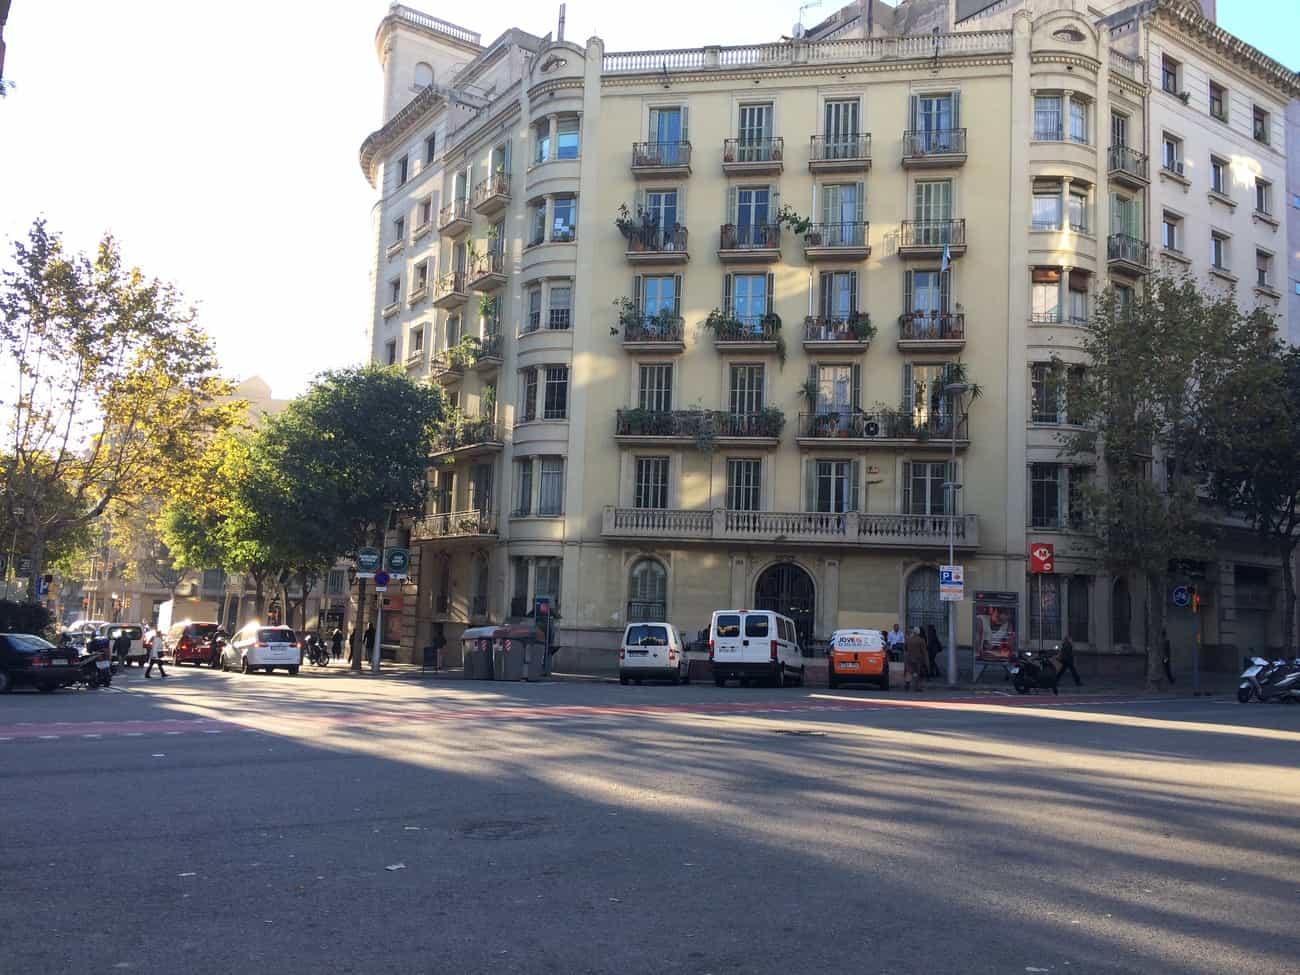 Barcelona - chamfered corners